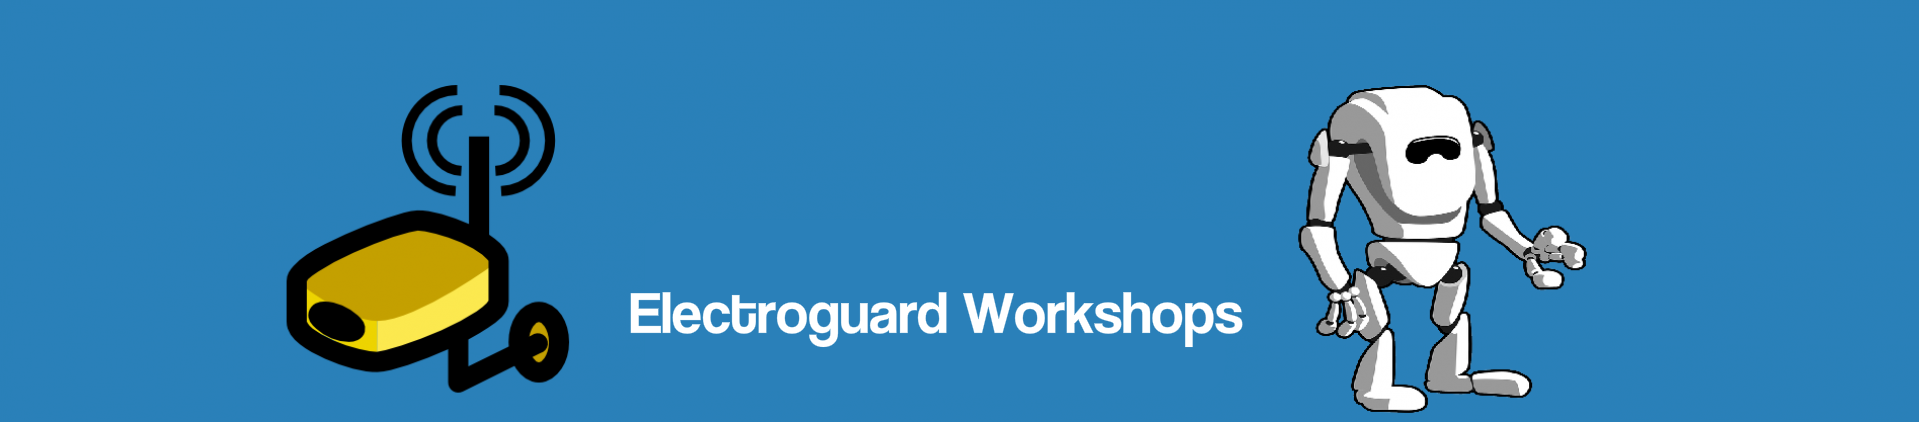 www.electroguard.eu